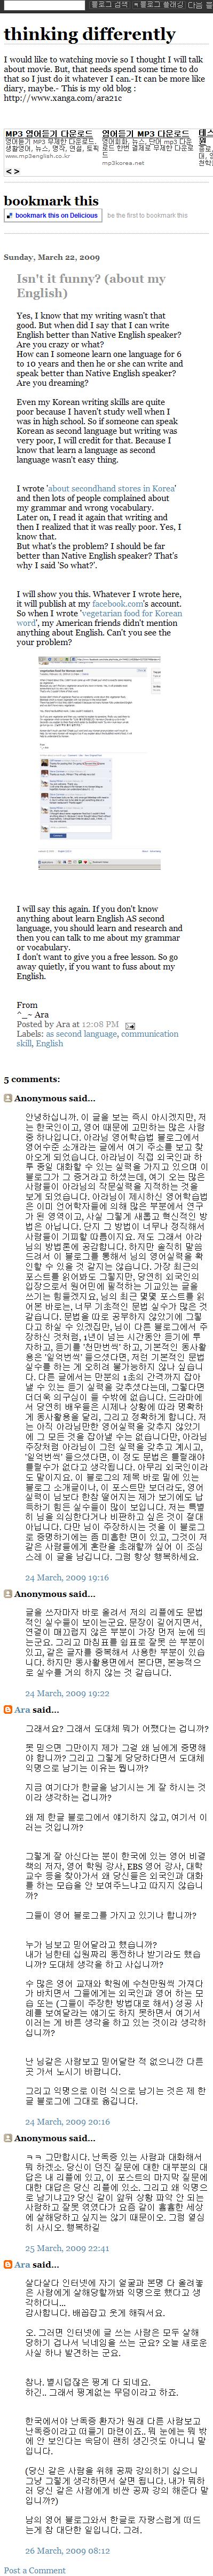 Isn't it funny (about my English)라는 글과 댓글 화면 캡처